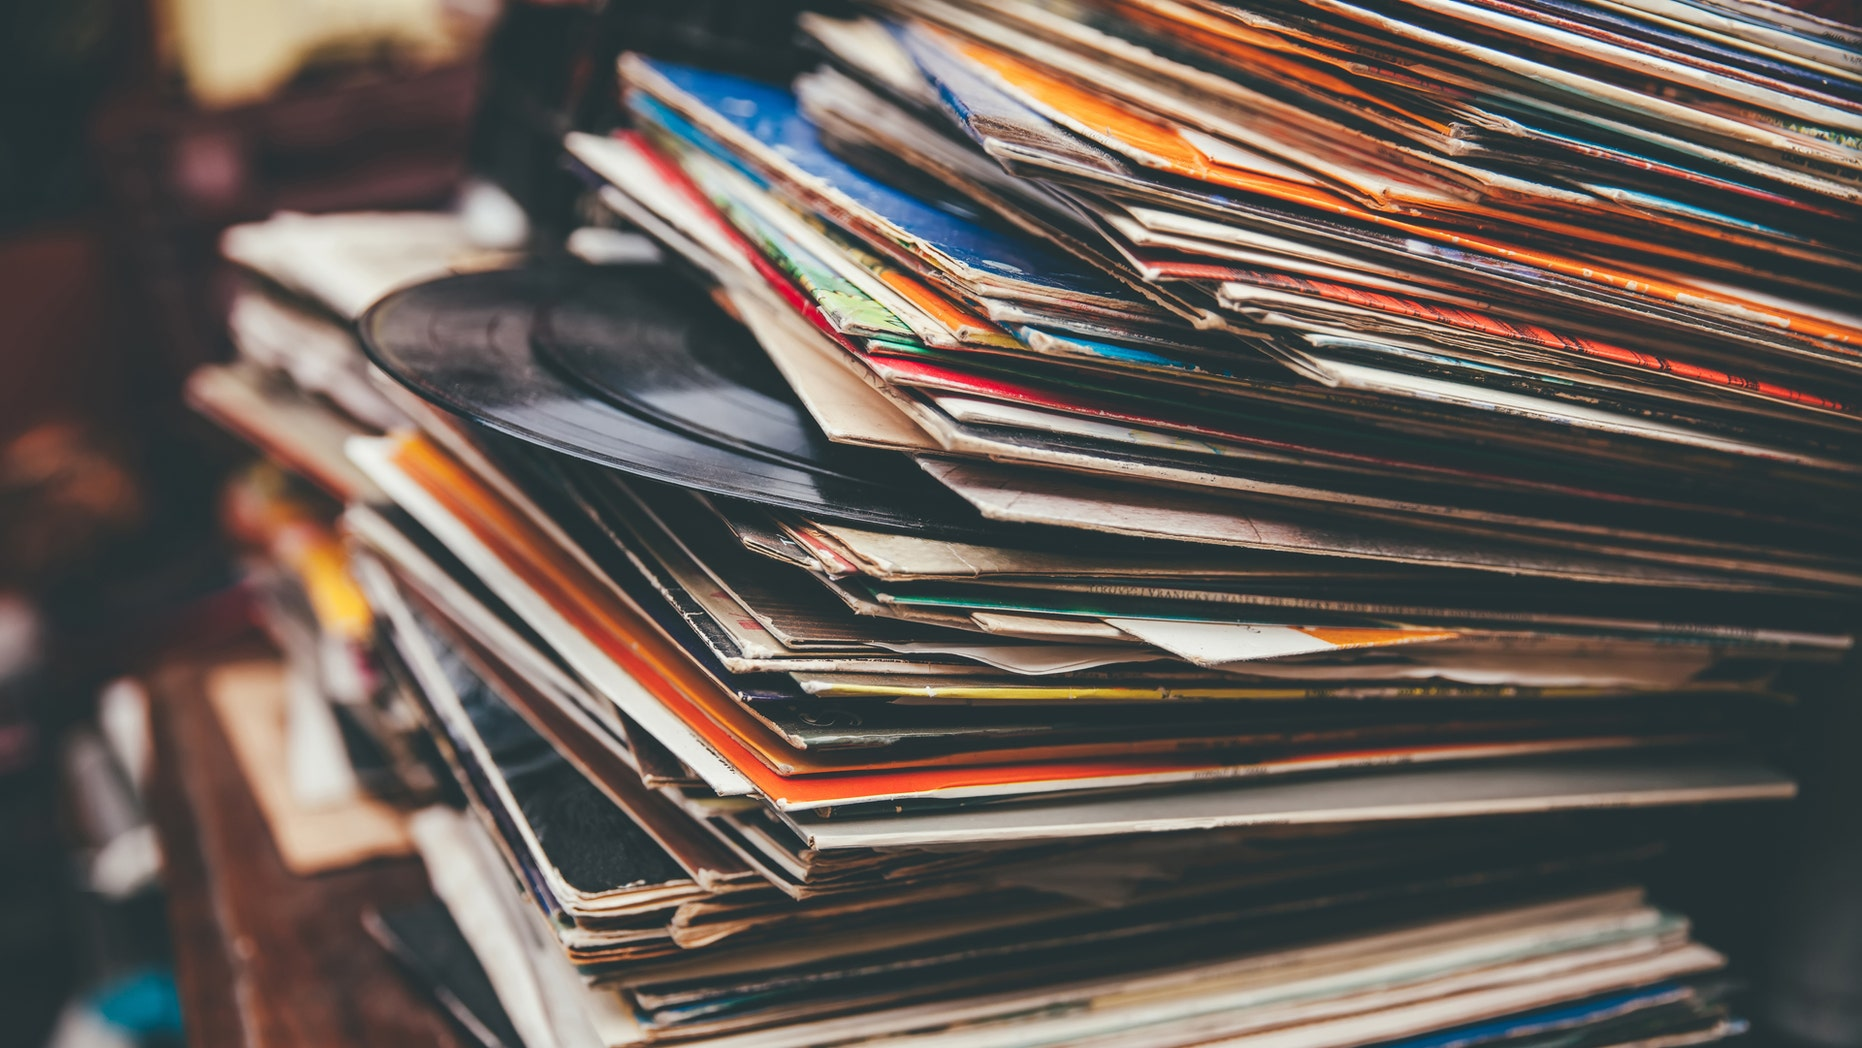 Retro styled lp records on a flea market. (Credit: iStock)